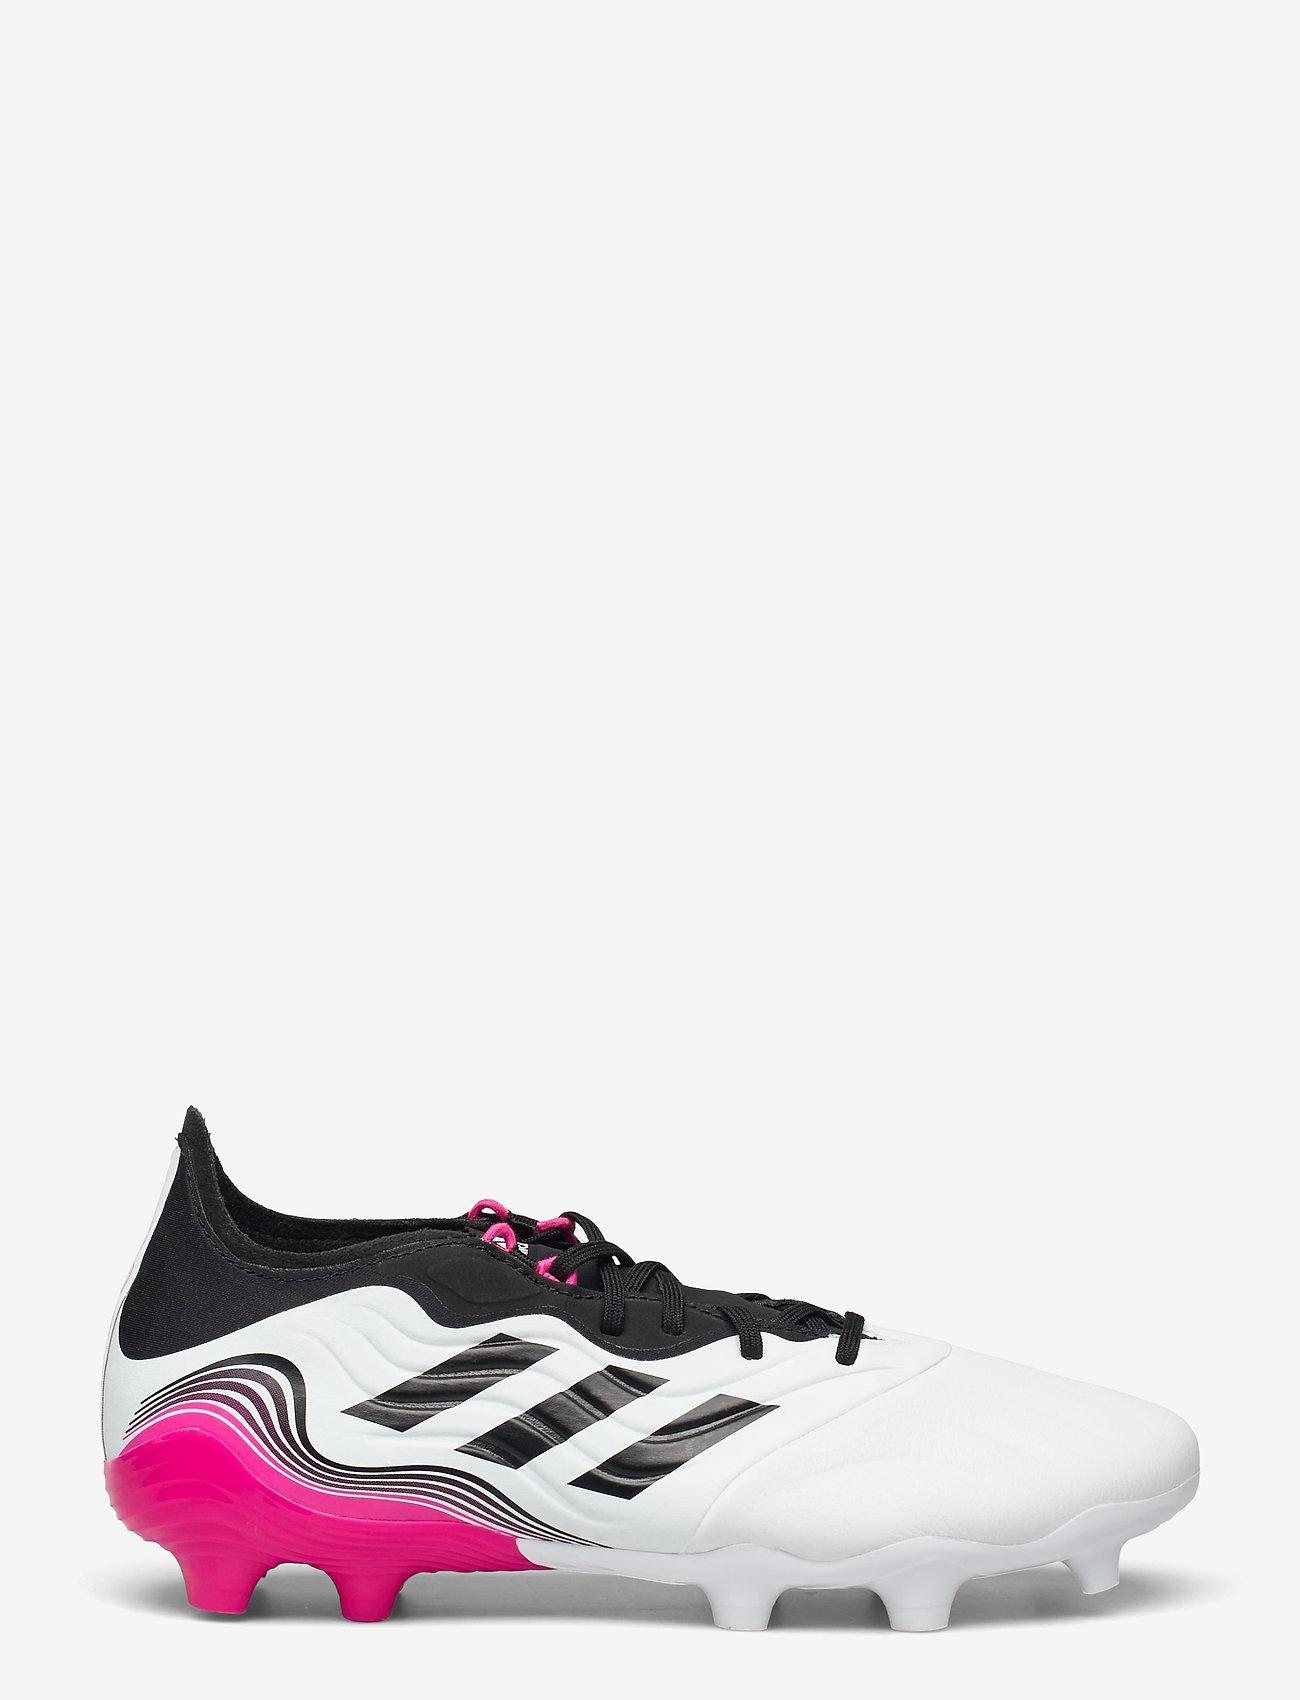 adidas Performance - Copa Sense.2 Firm-Ground Boots - fodboldsko - ftwwht/cblack/shopnk - 1